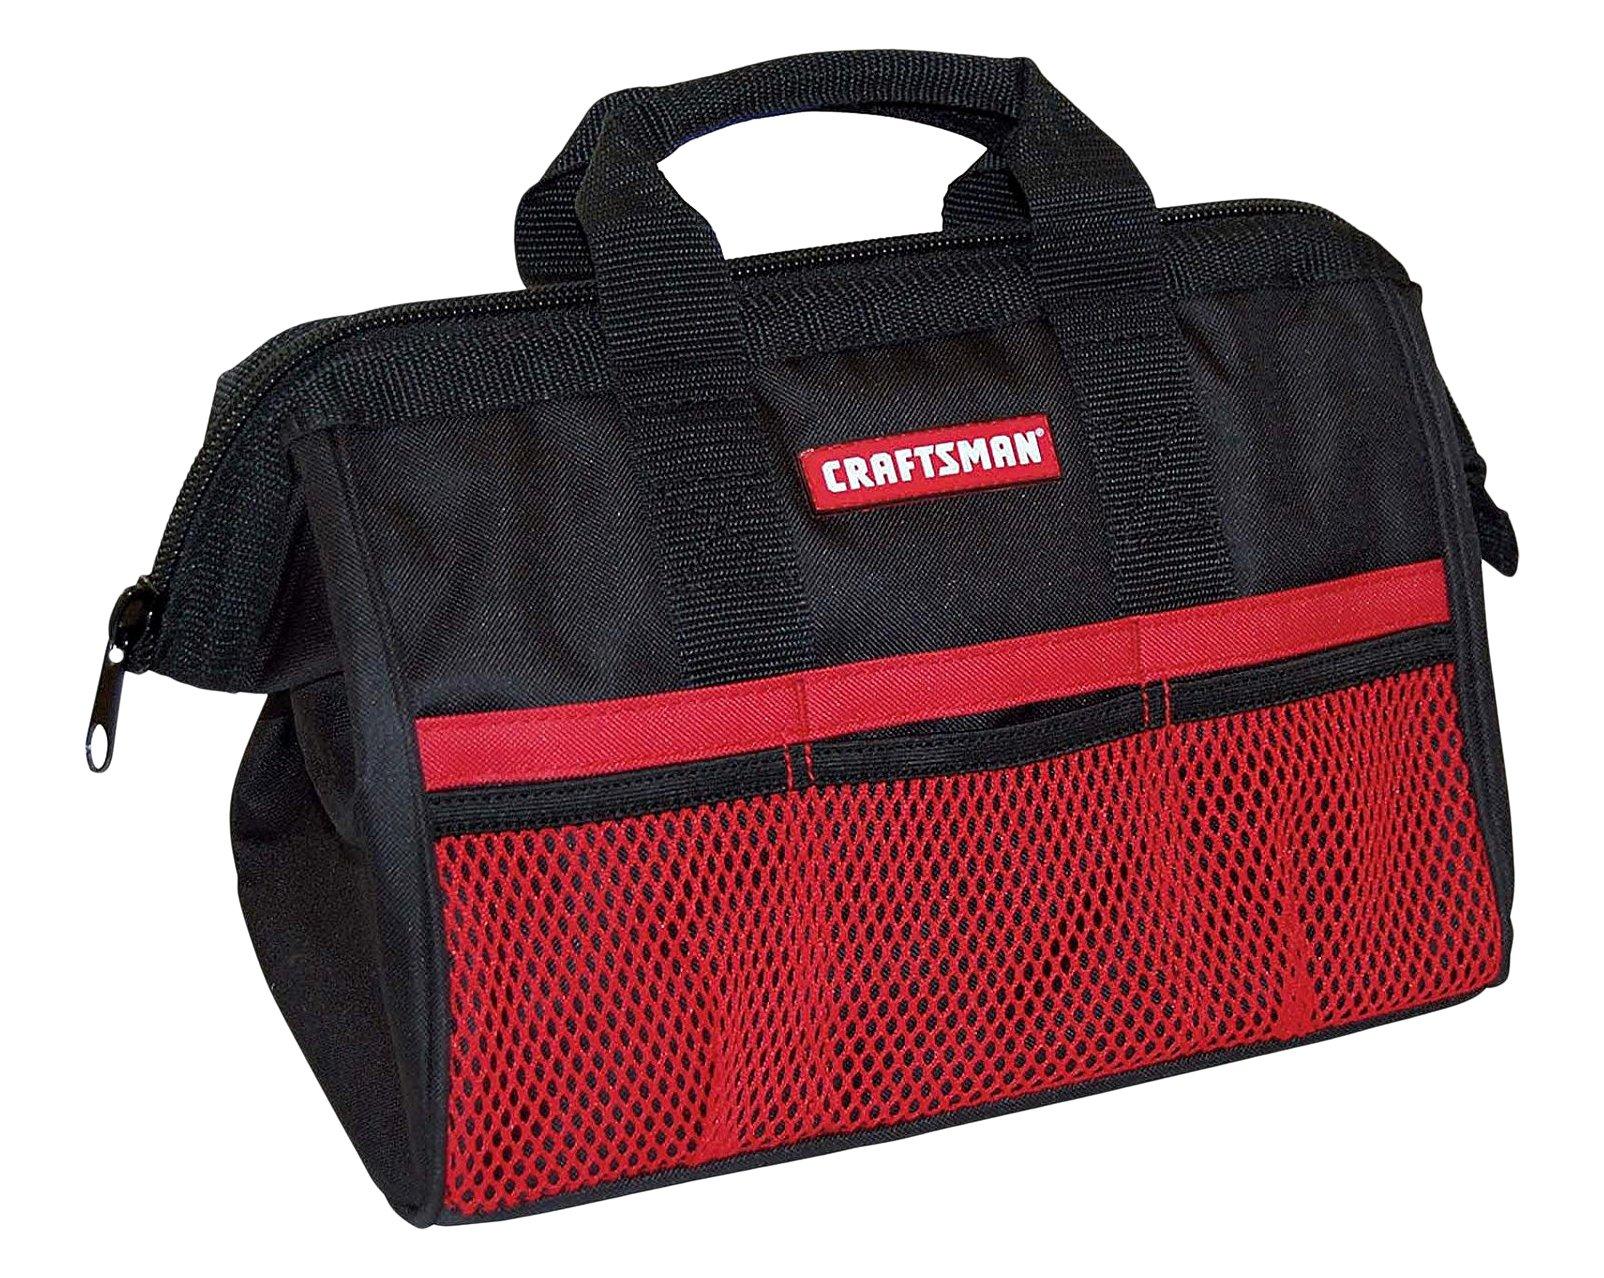 Craftsman 9-37535 Soft Tool Bag, 13''